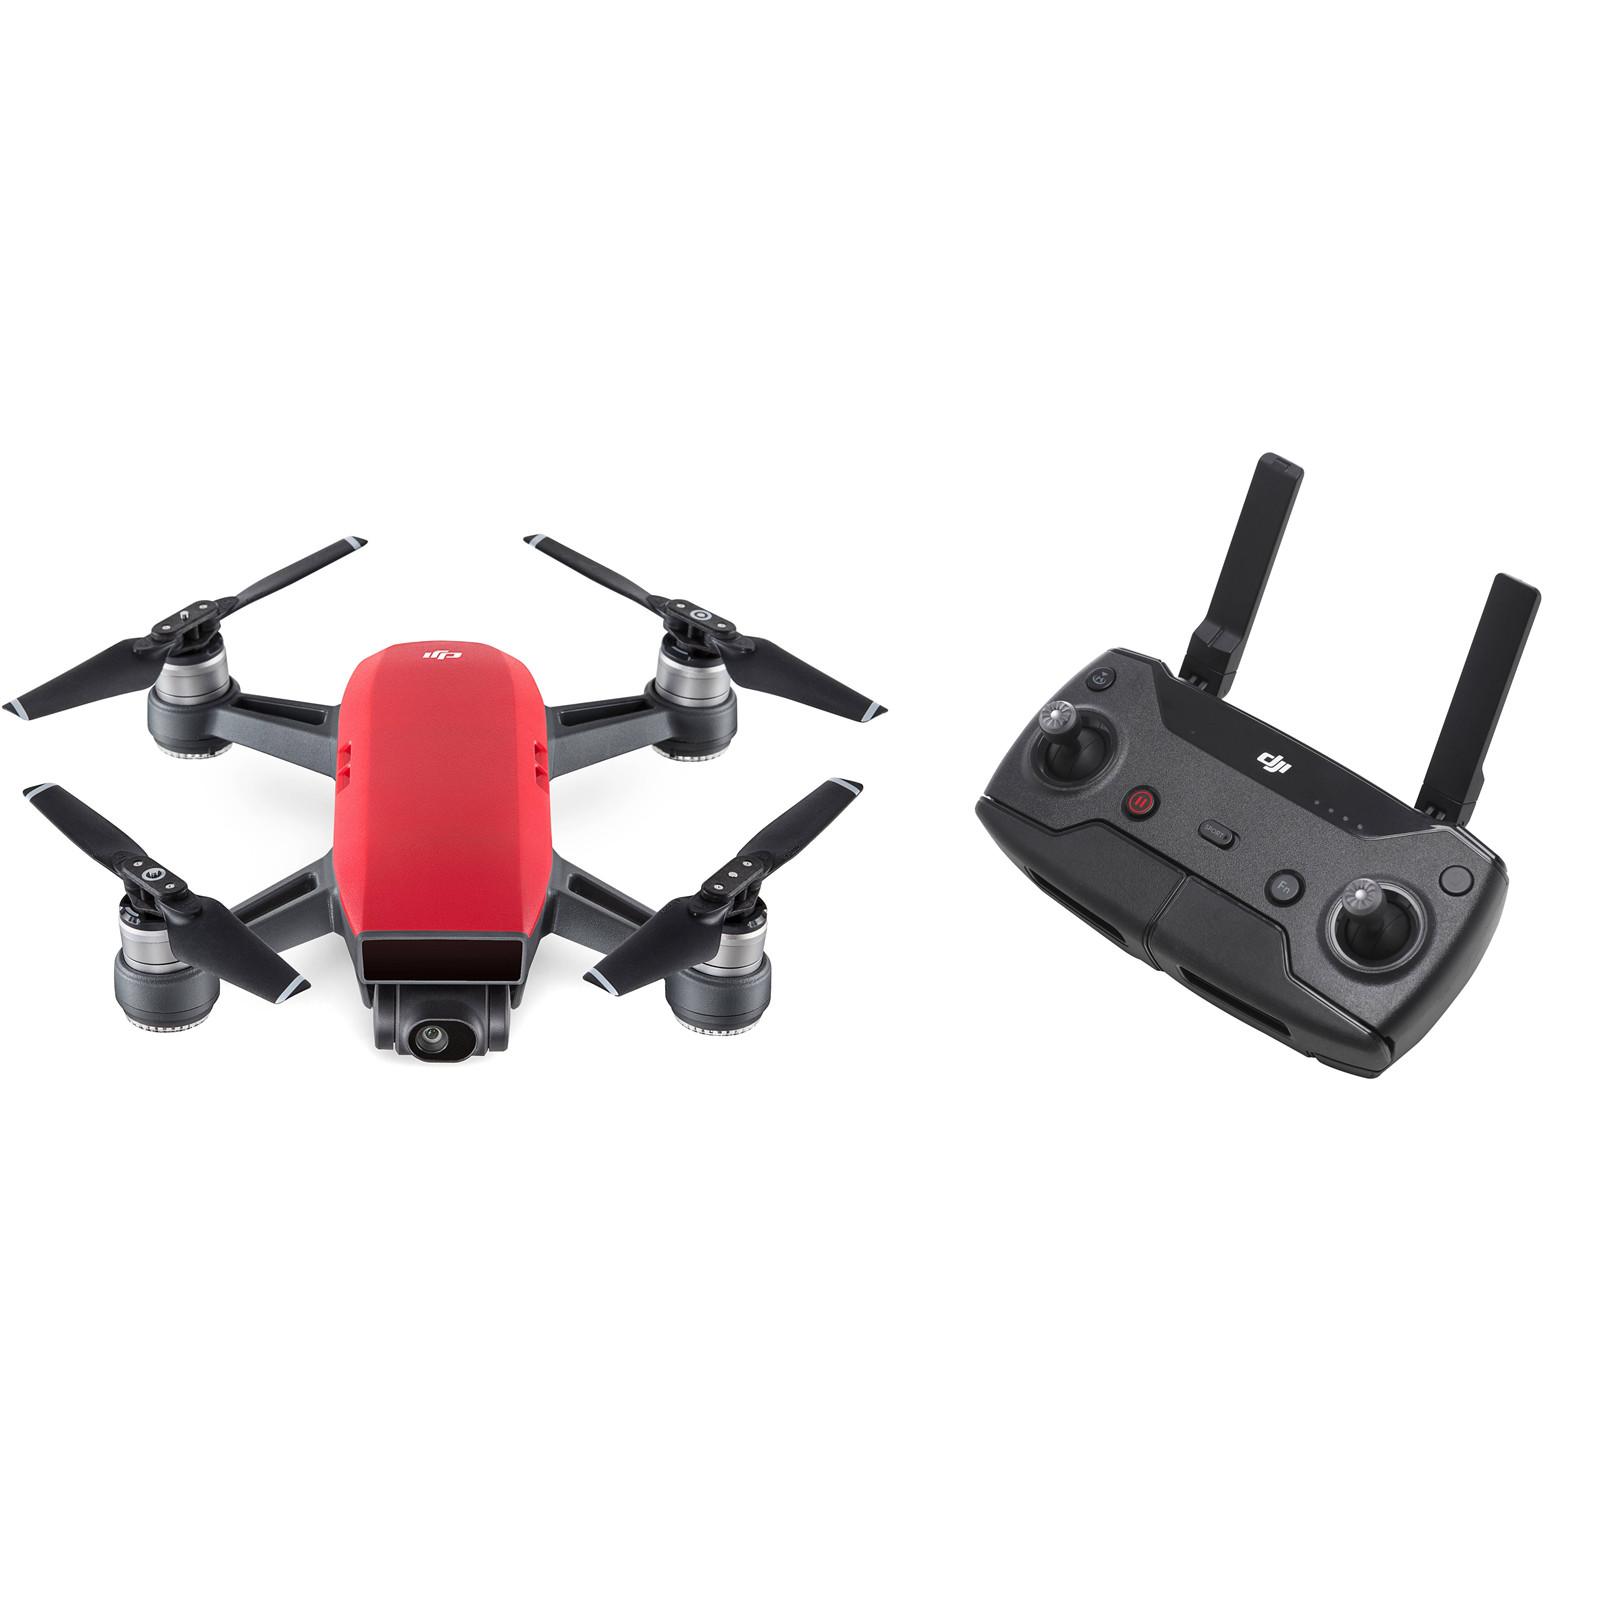 Promotion drone camera bluetooth, avis drone modelco